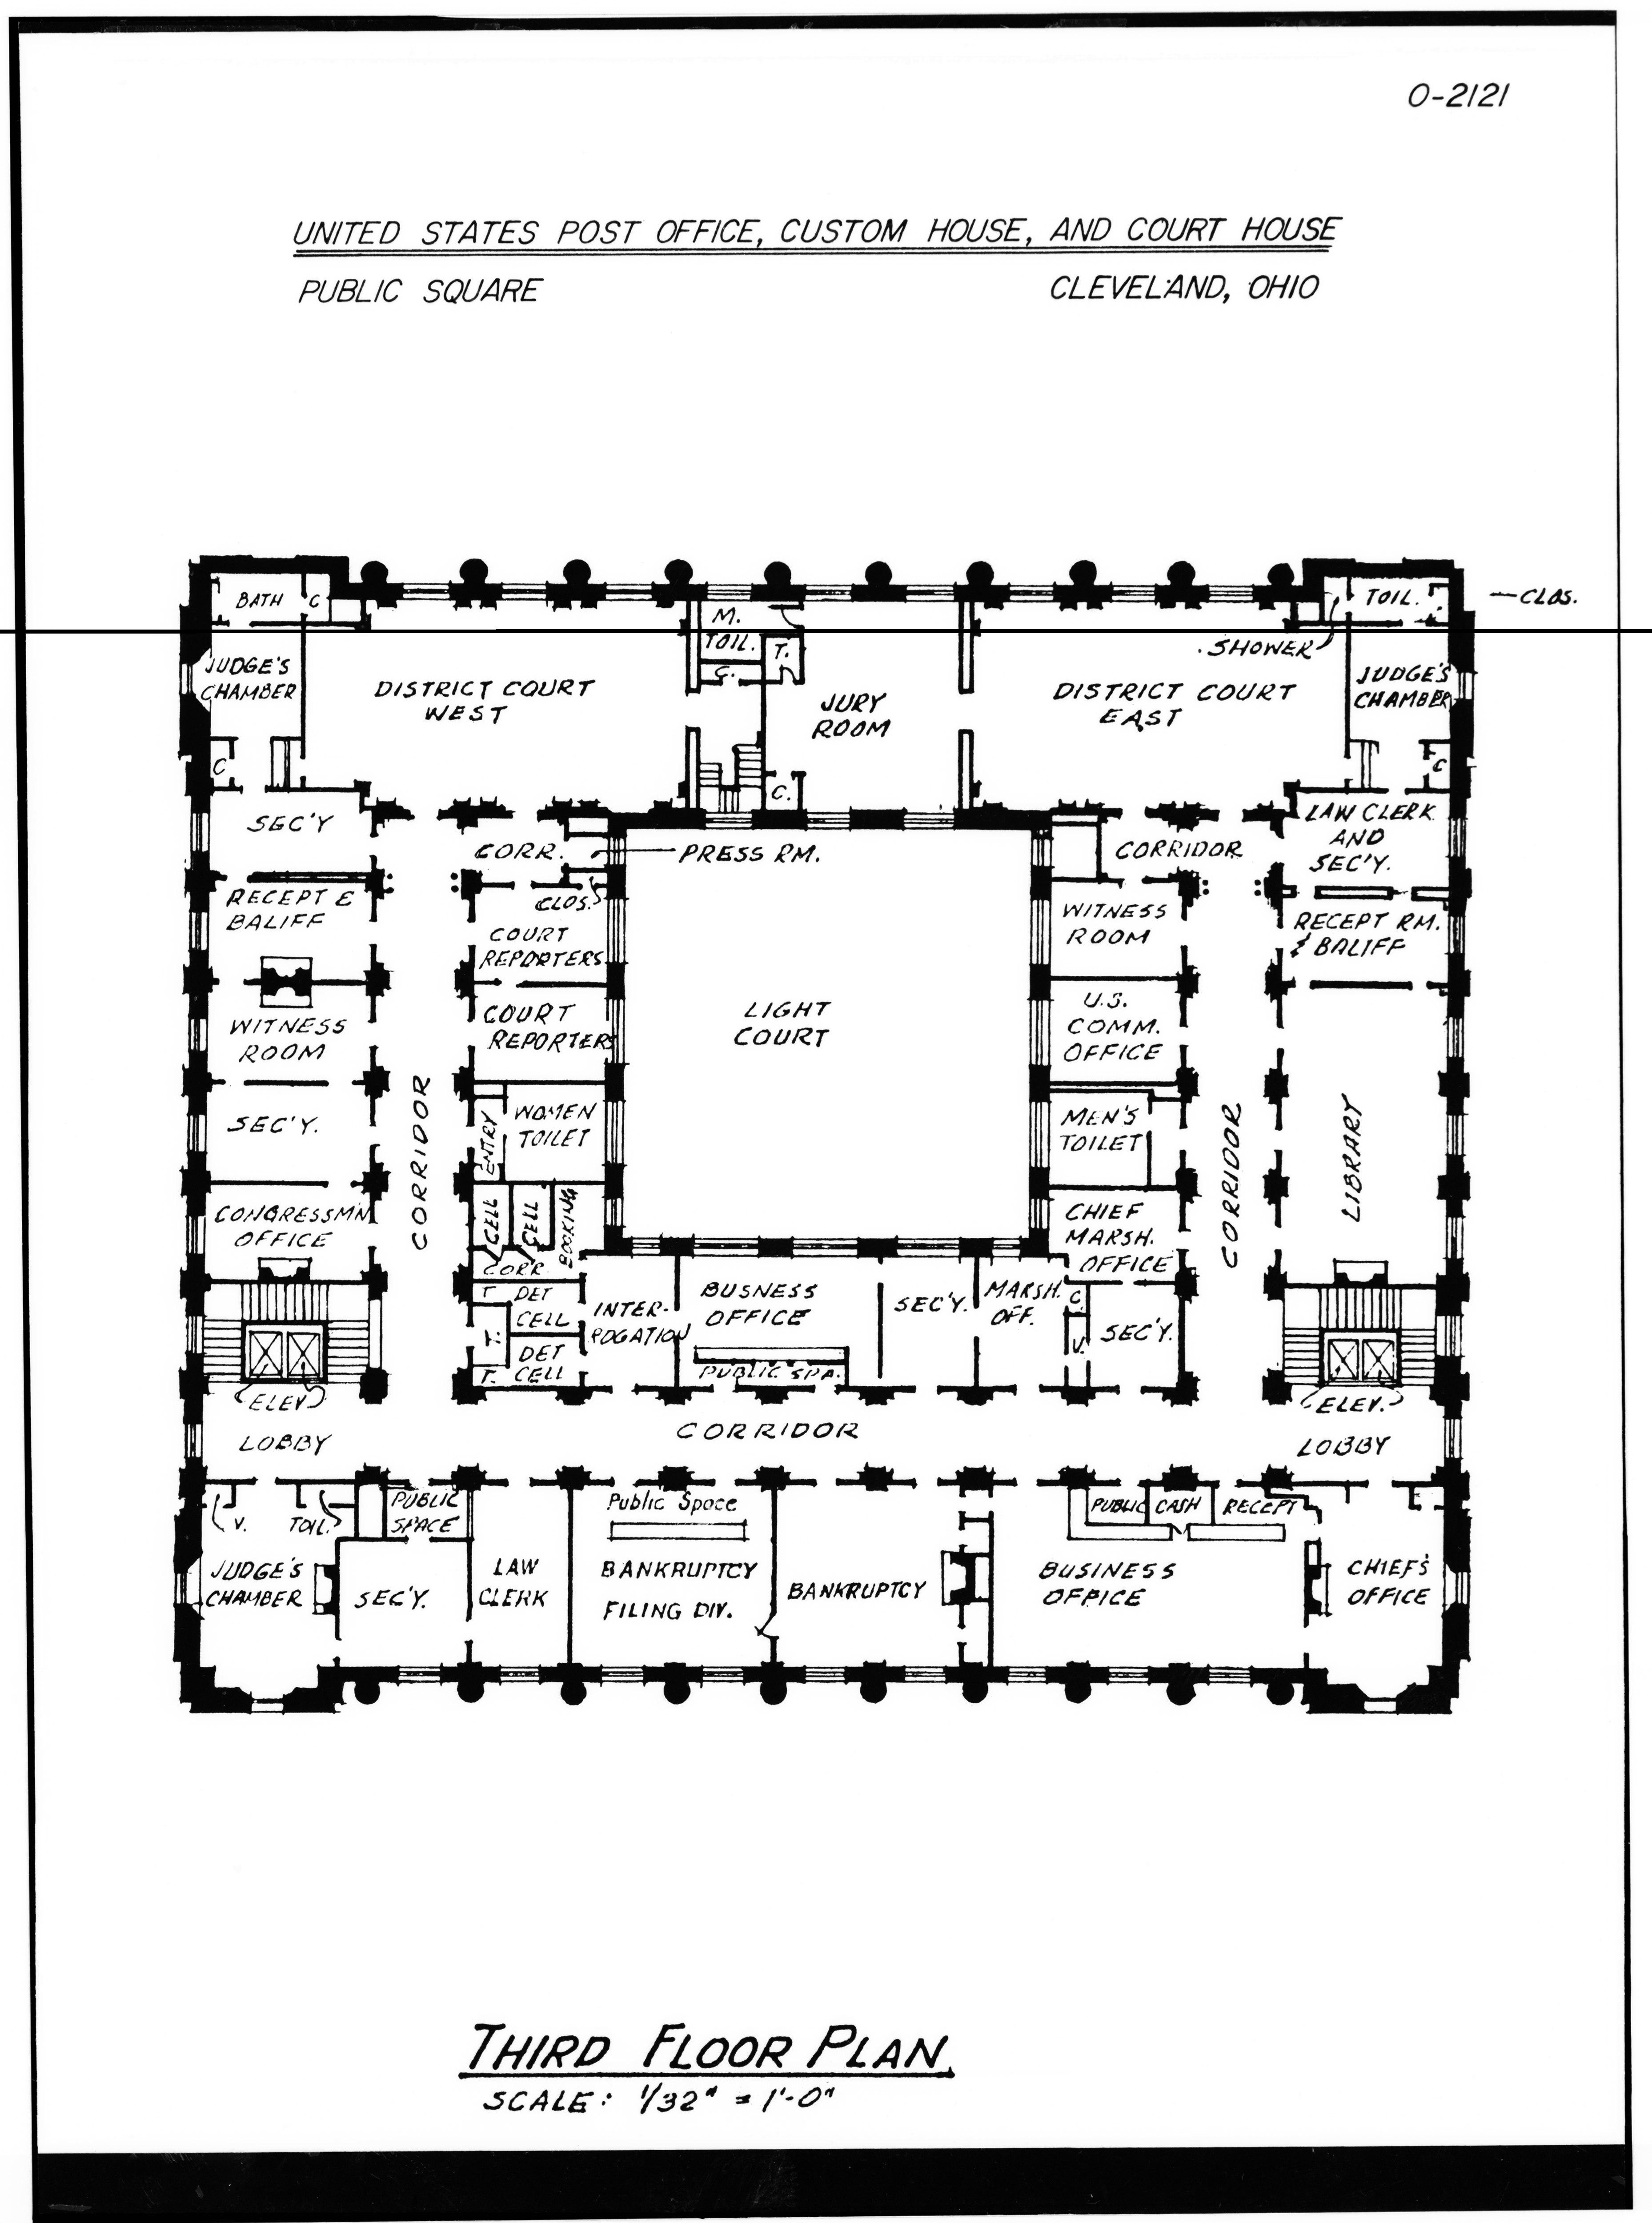 File Historic American Buildings Survey Third Floor Plan